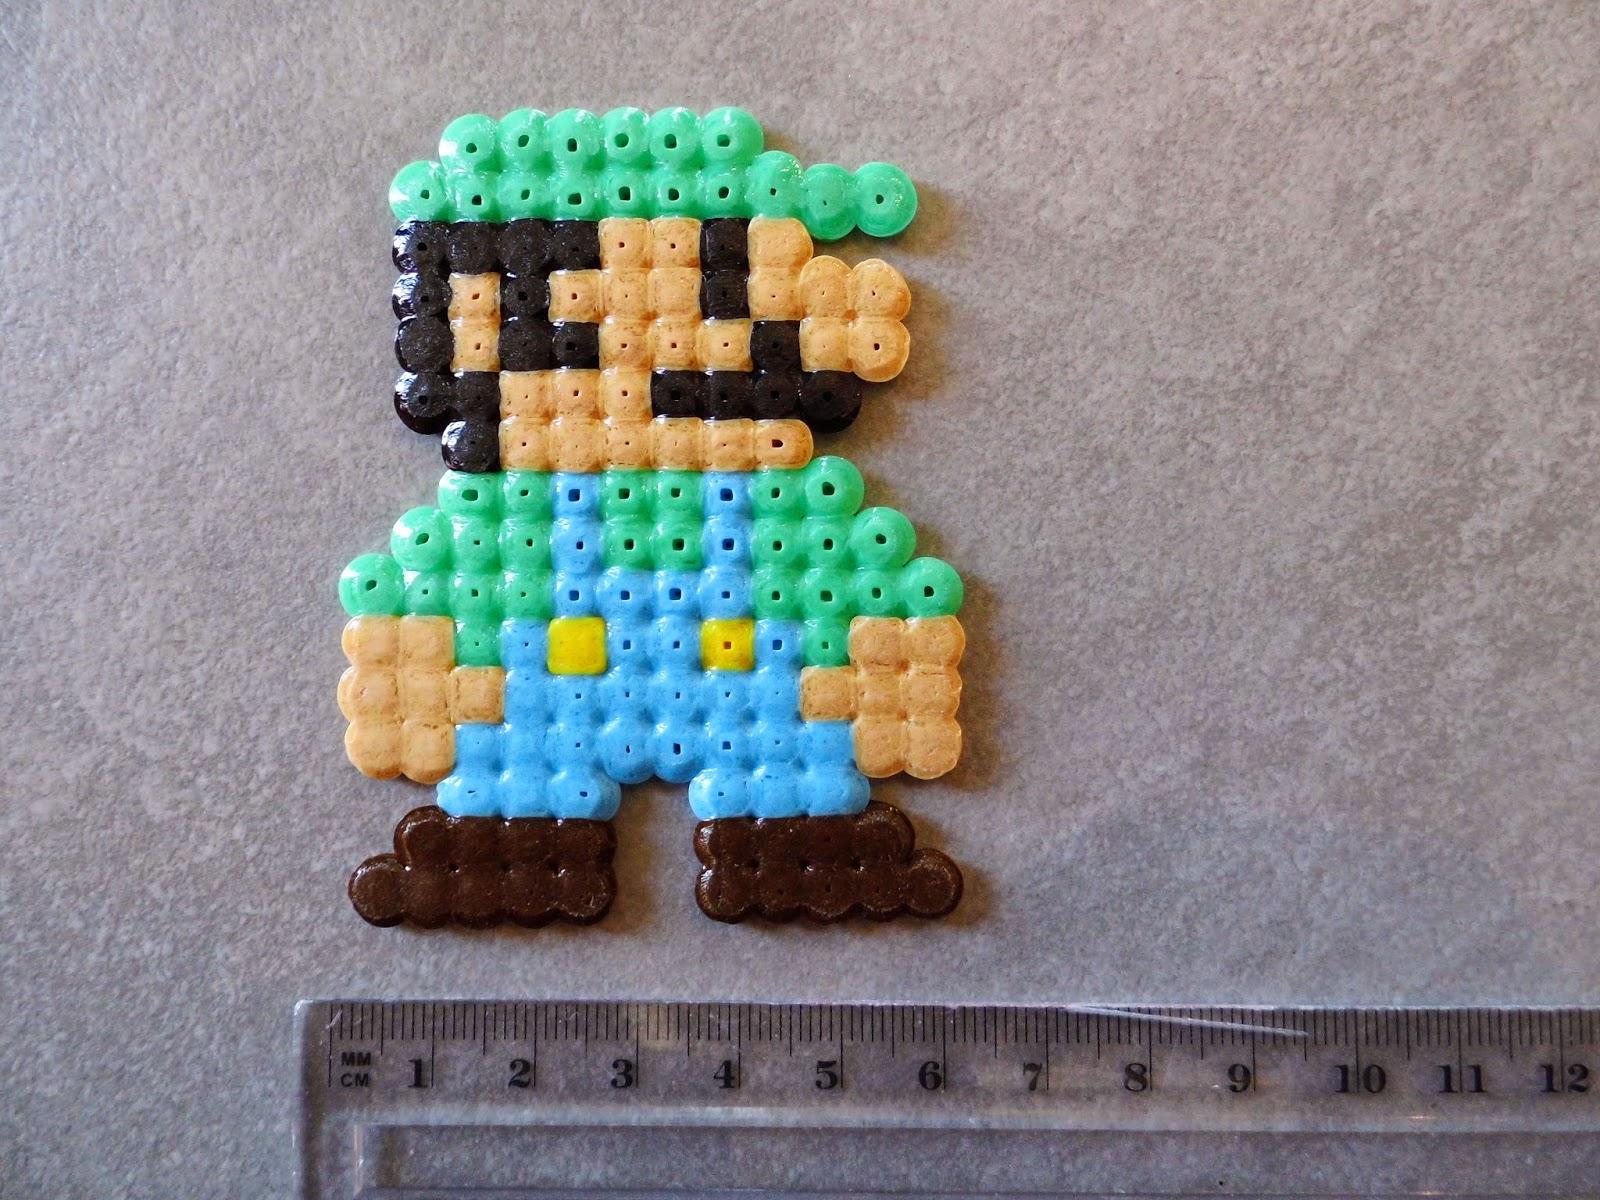 pixel art en perle hama personnage jeux video en hama beads. Black Bedroom Furniture Sets. Home Design Ideas